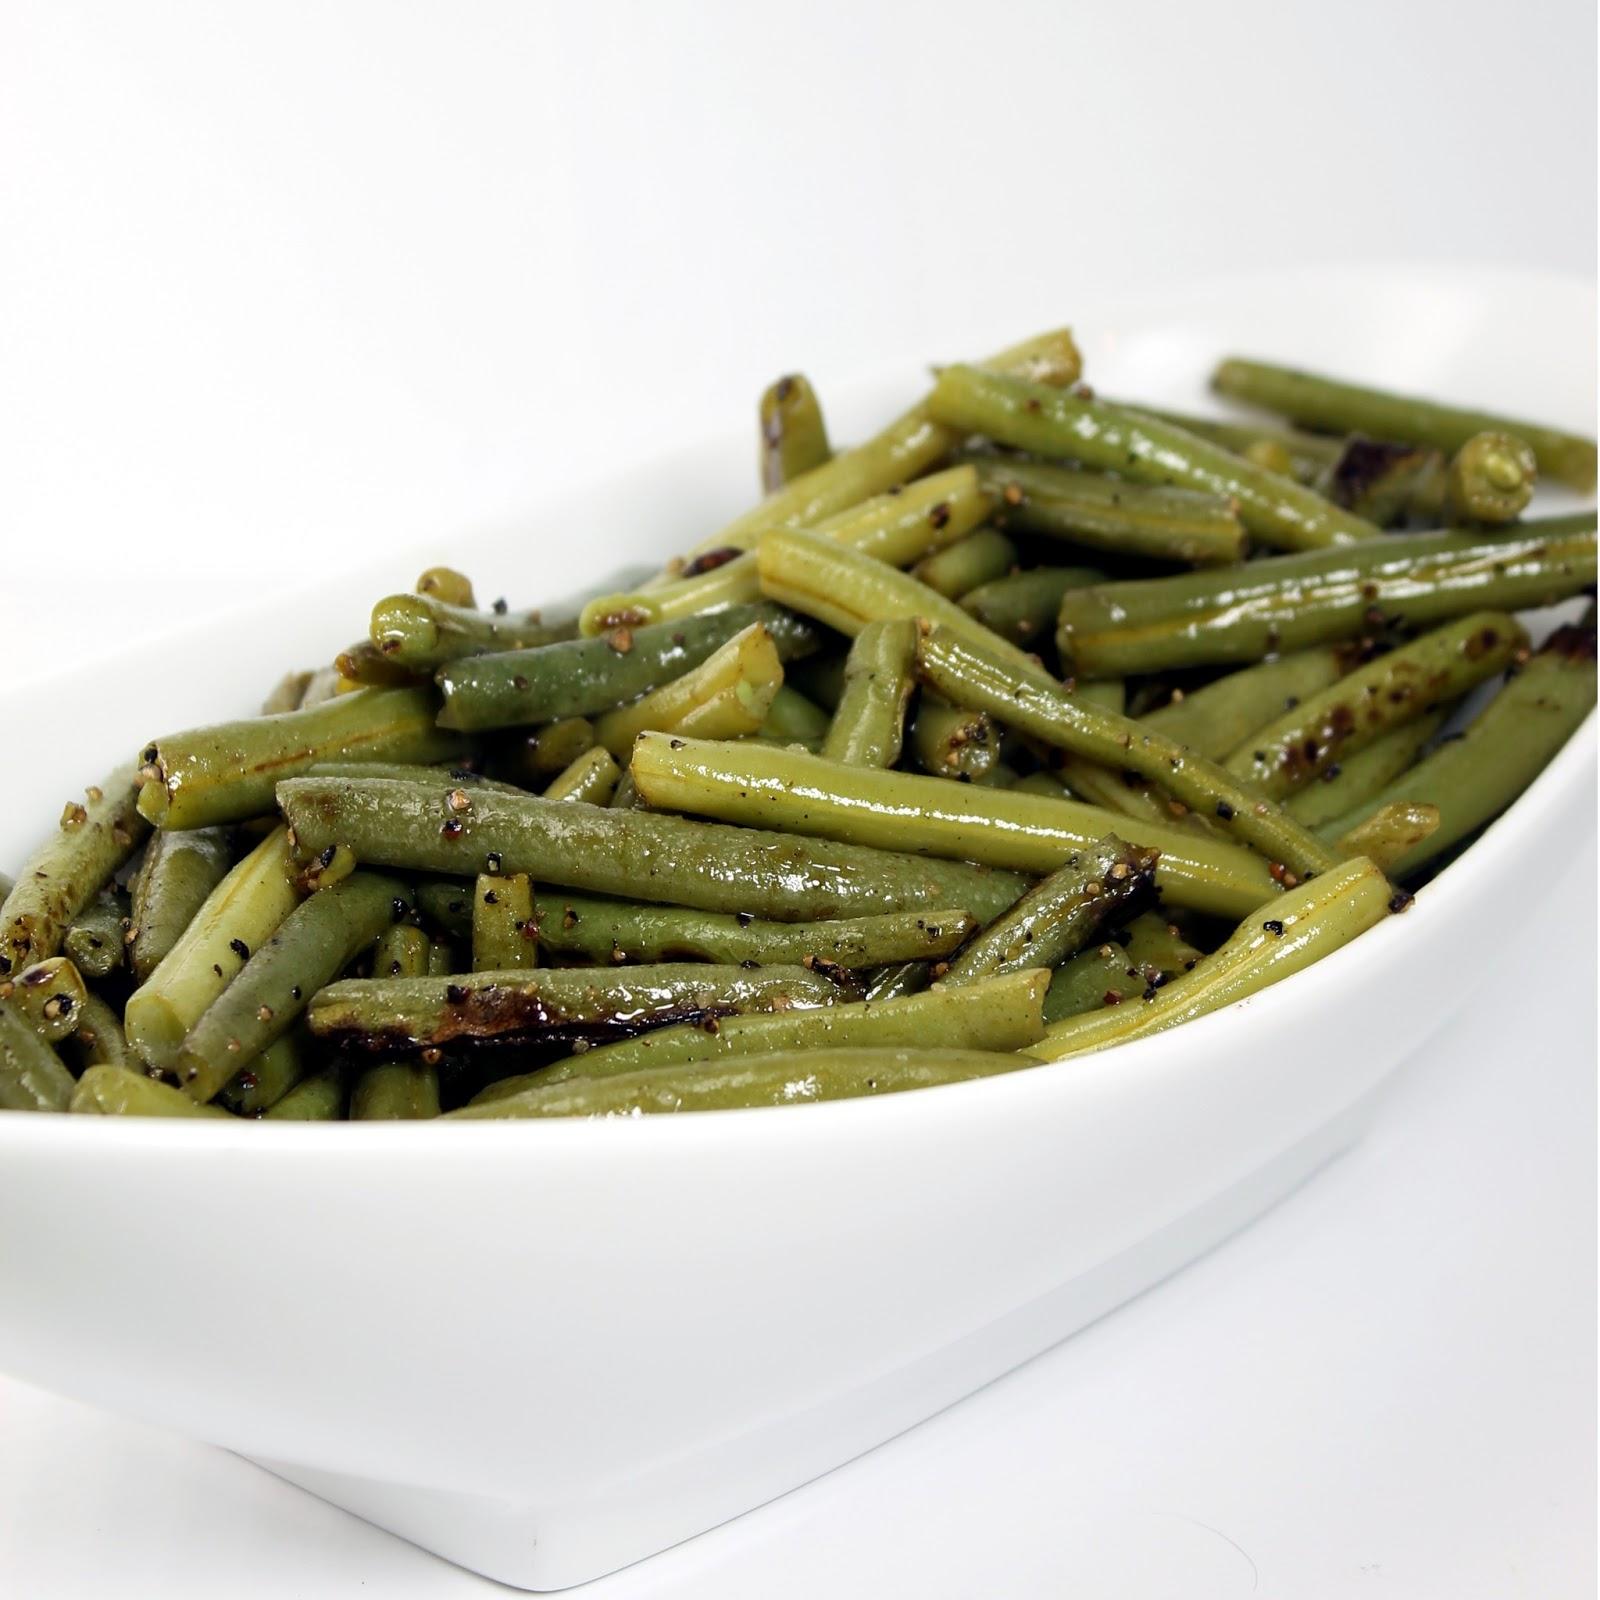 olive oil green beans with salt and pepper. Black Bedroom Furniture Sets. Home Design Ideas